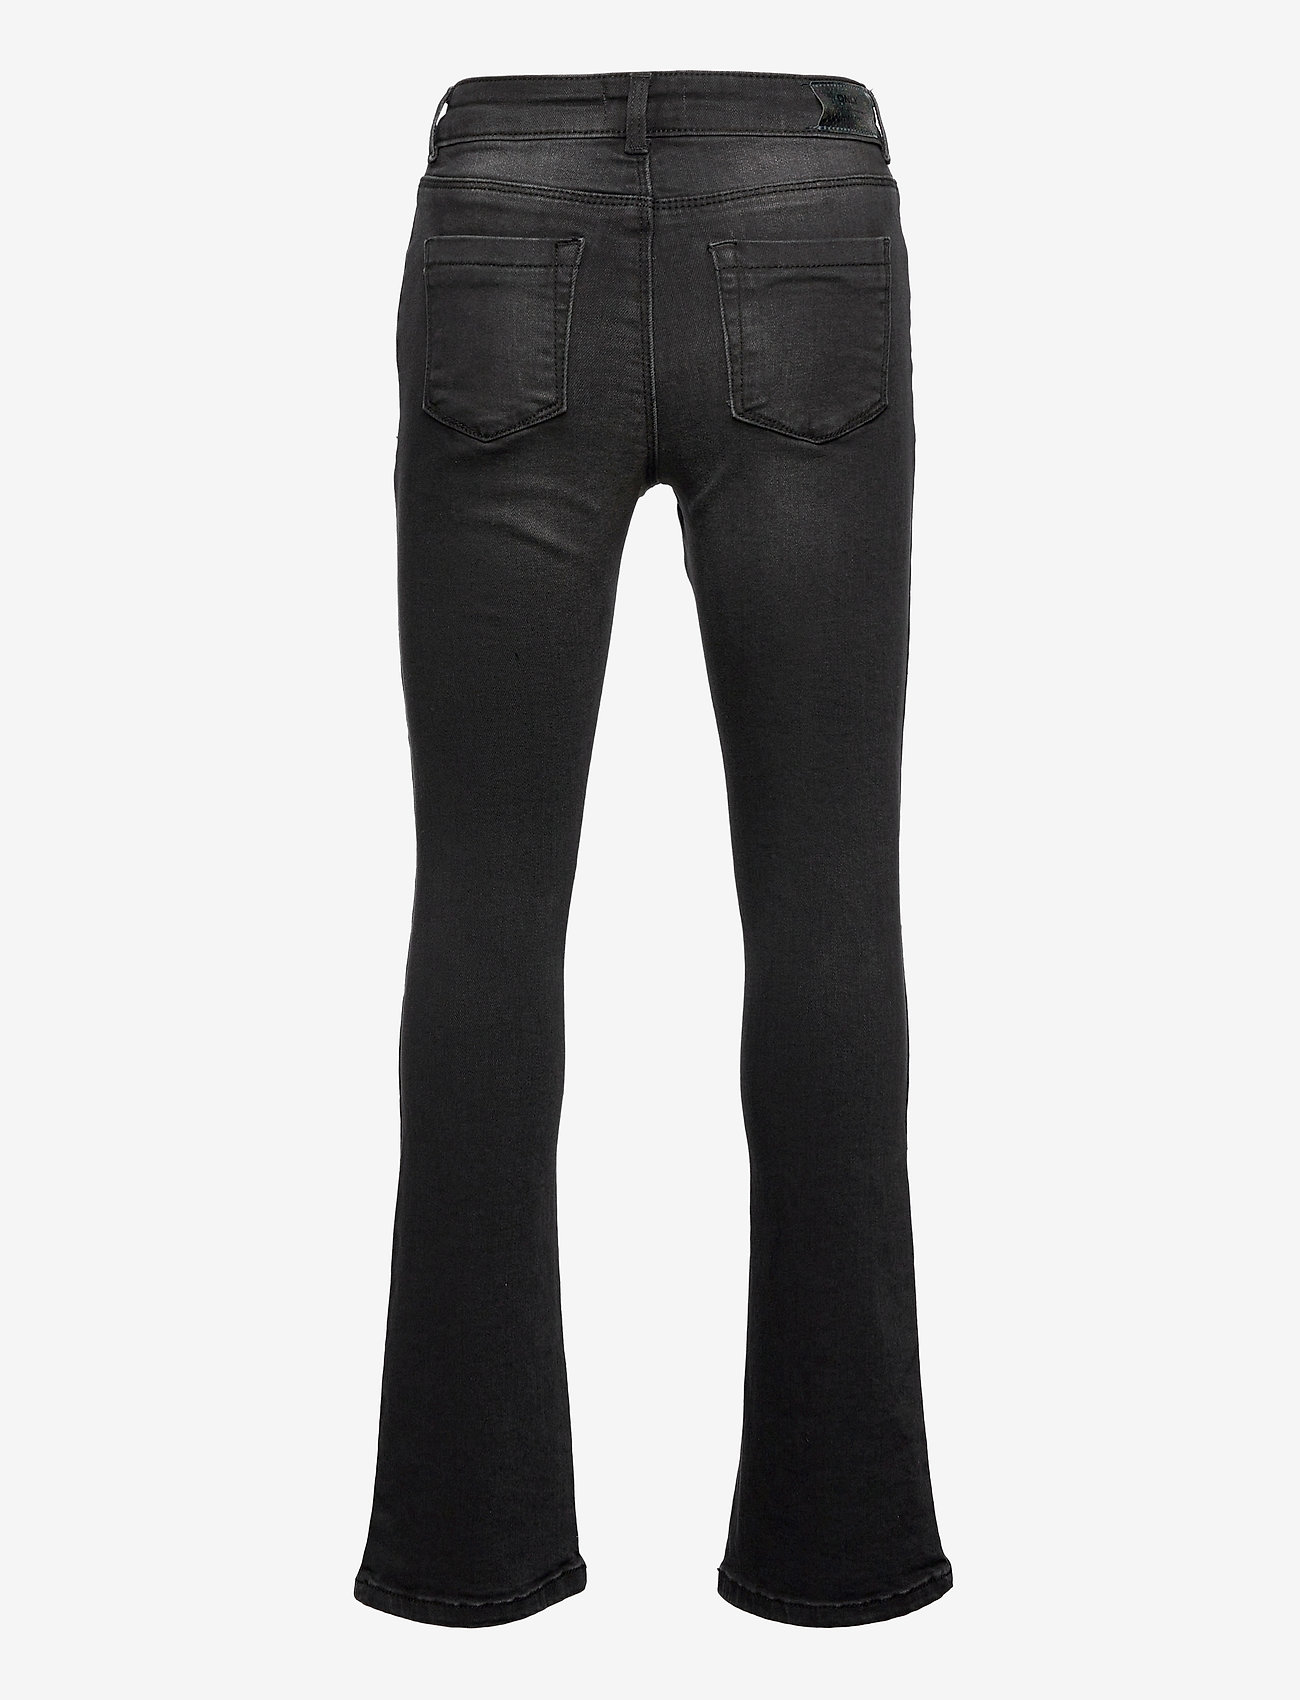 Kids Only - KONLINN FLARED DARK GREY DNM JEANS  AZG - jeans - dark grey denim - 1